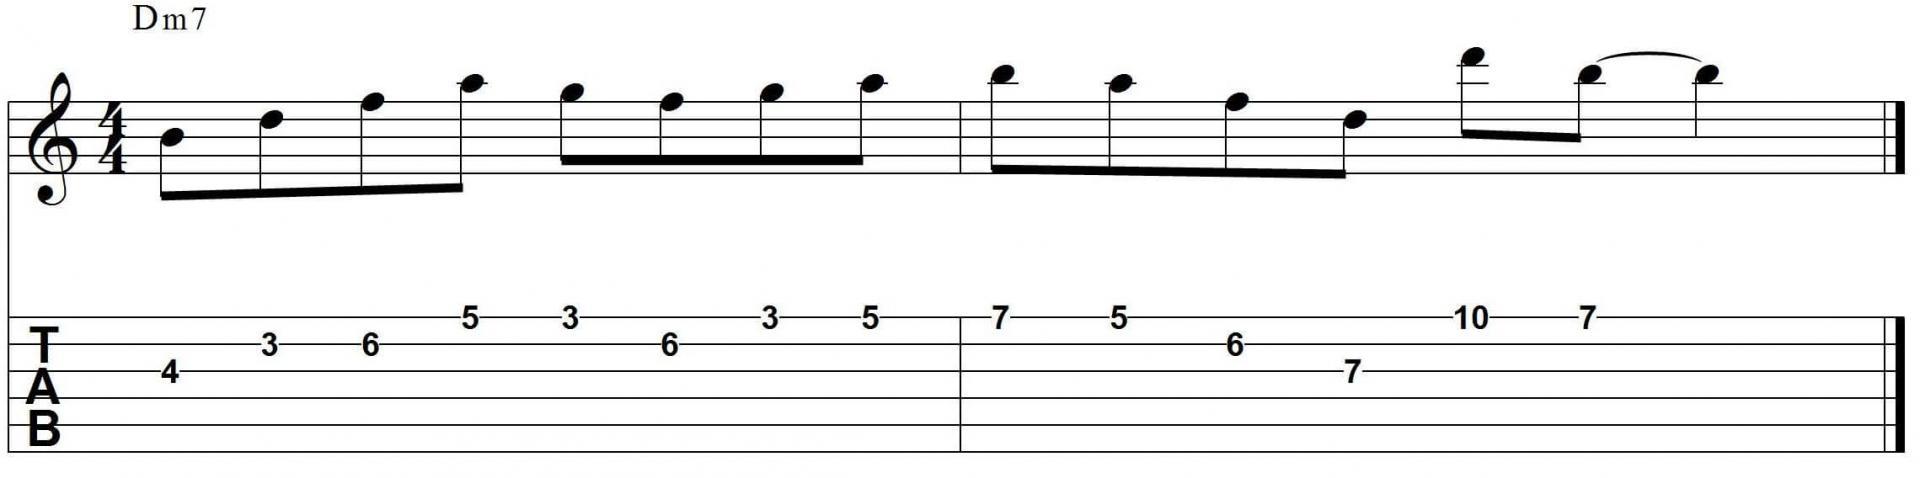 minor jazz guitar lick half diminished arpeggio